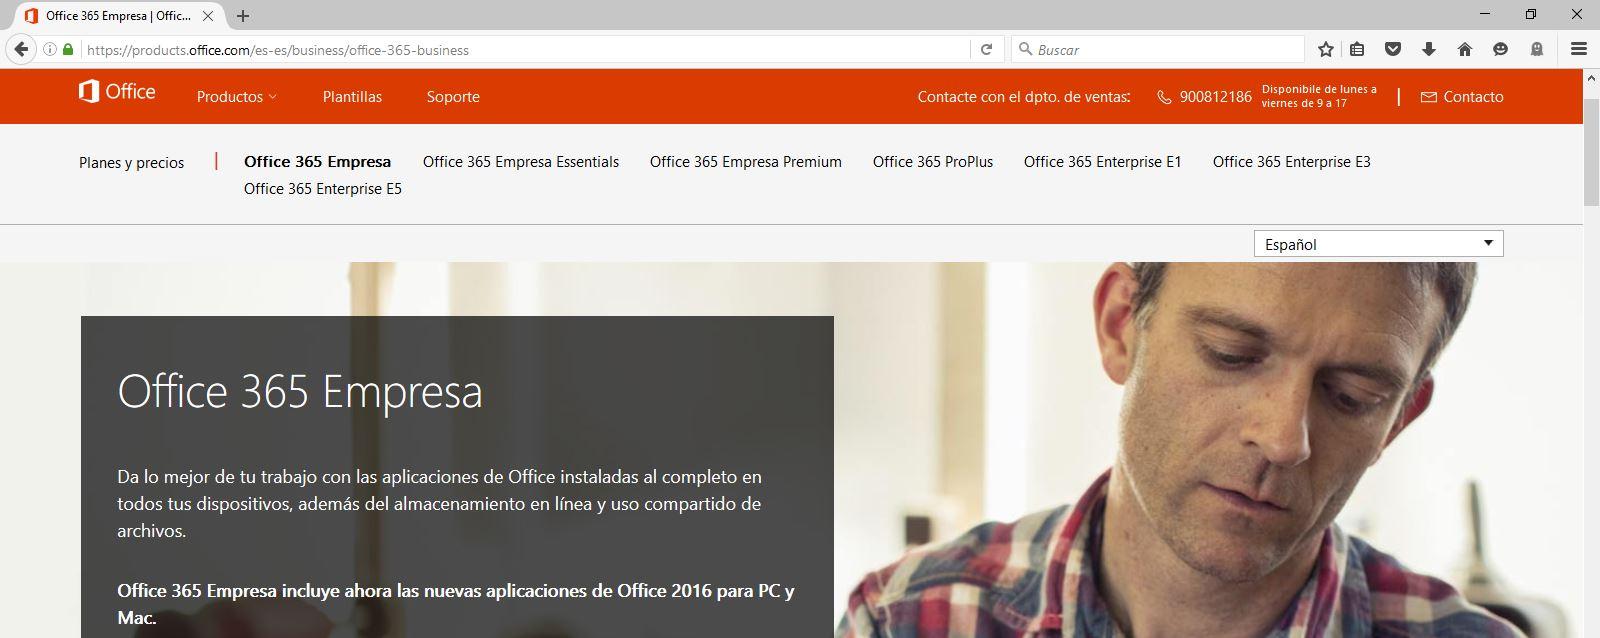 Office 365 empresas